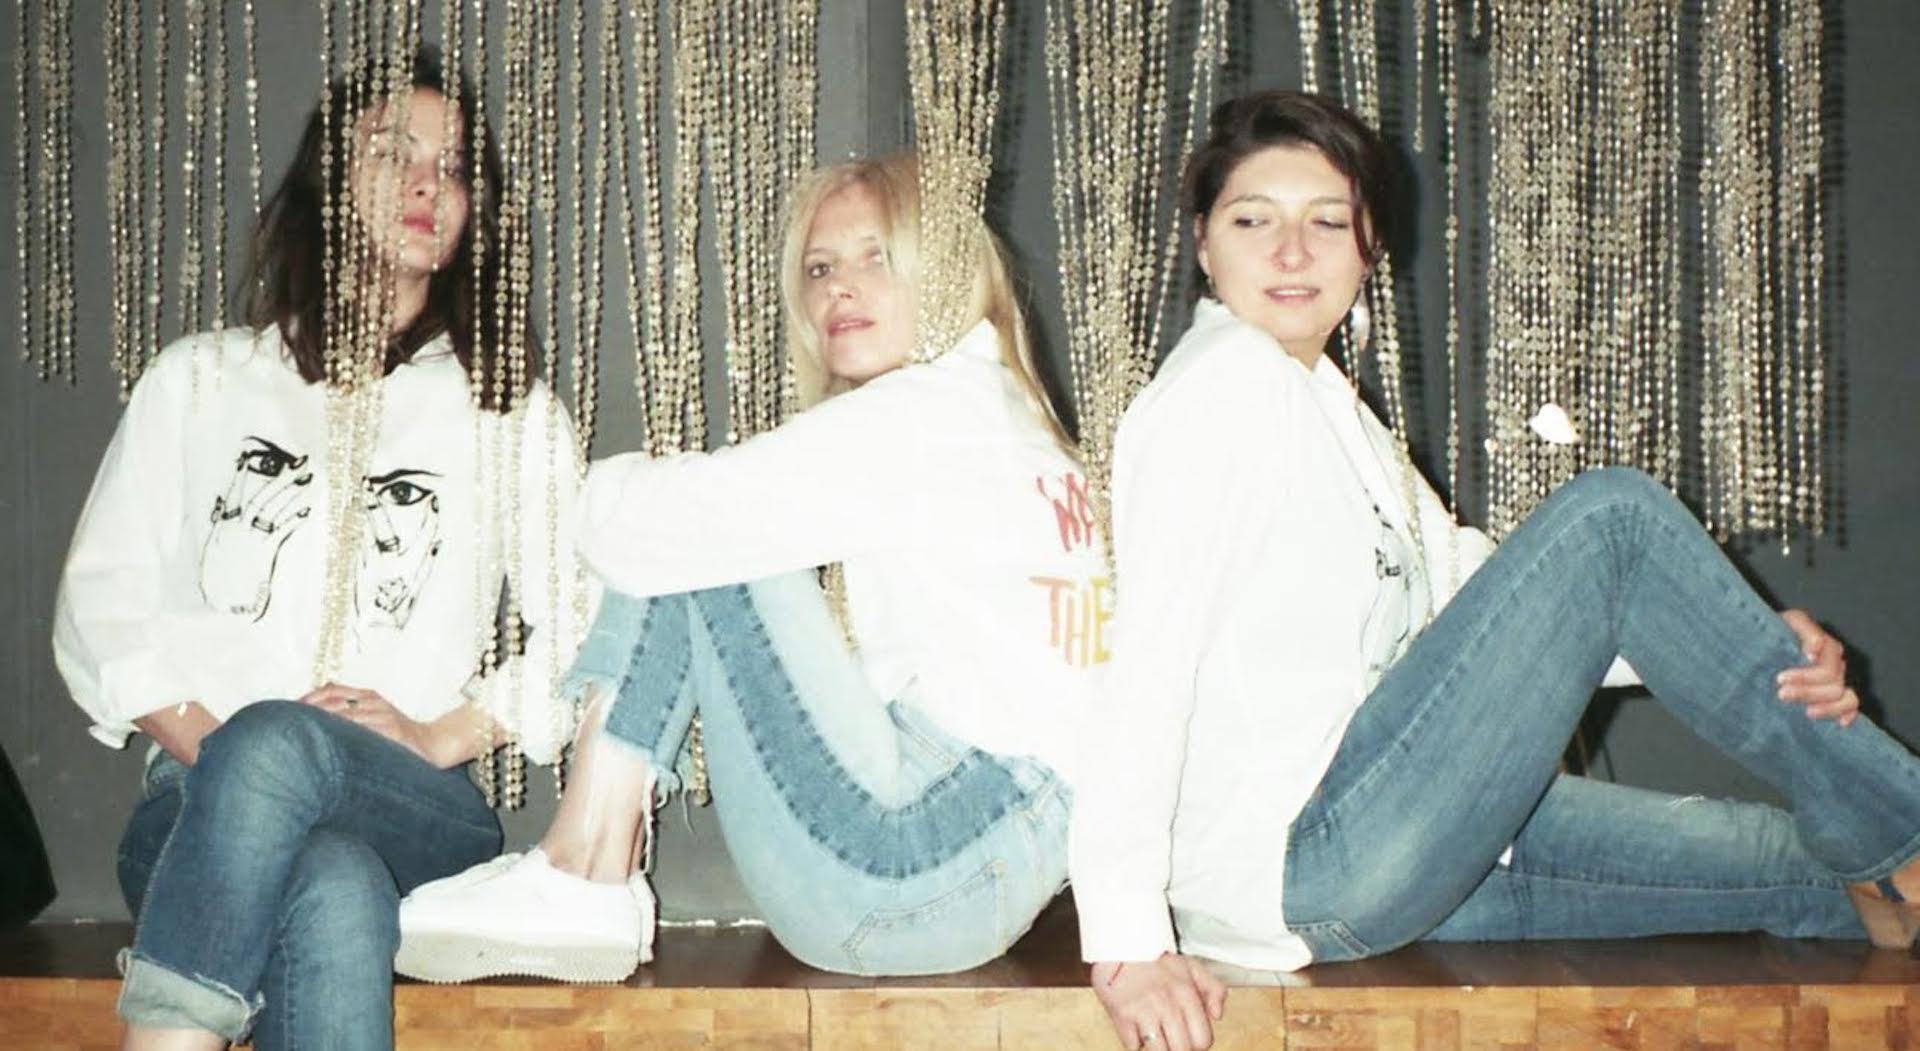 Camasa Hungry Eyes, Marina Moldovan, eu si Alina Rachieru